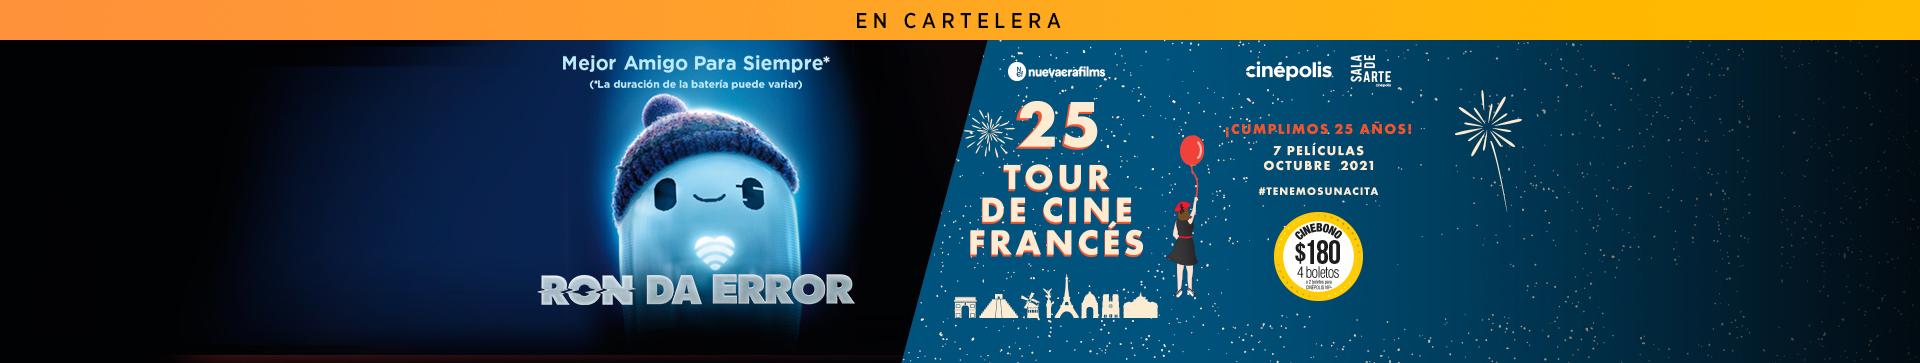 En cartelera Ron Da Error y 15 Tour de Cine Francés